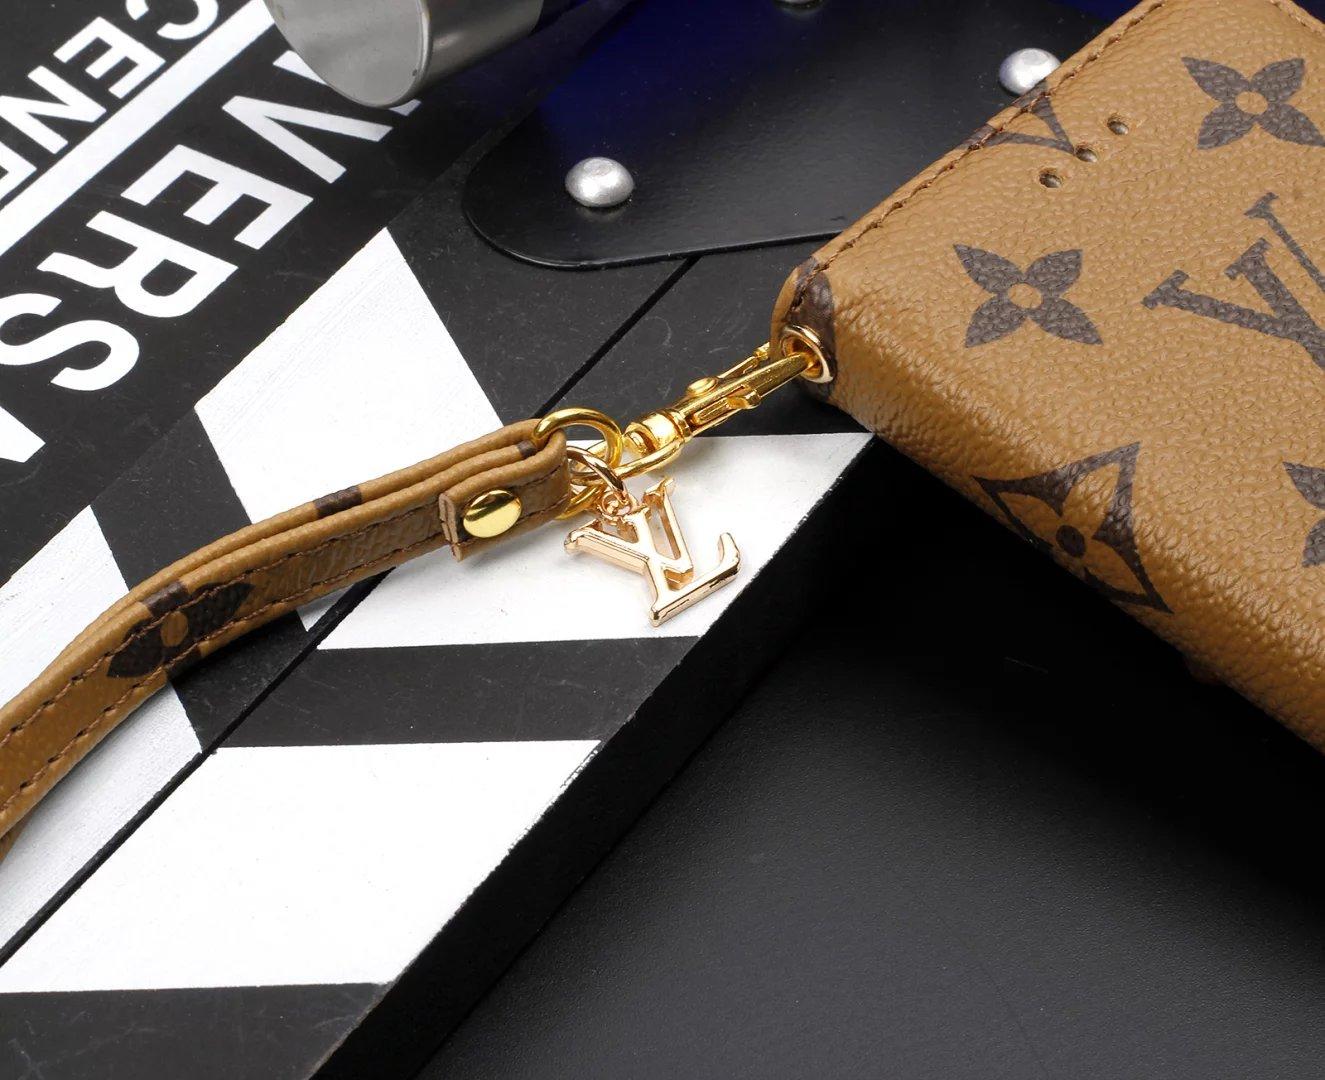 iphone case selbst gestalten günstig iphone gummihülle Louis Vuitton iphone6 plus hülle iphone 6 Plus apple ca6 iphone 6 Plus over holz iphone s6 hülle iphone 6 Plus hülle leder handy hülle bedrucken handy schutzhülle iphone 6 Plus